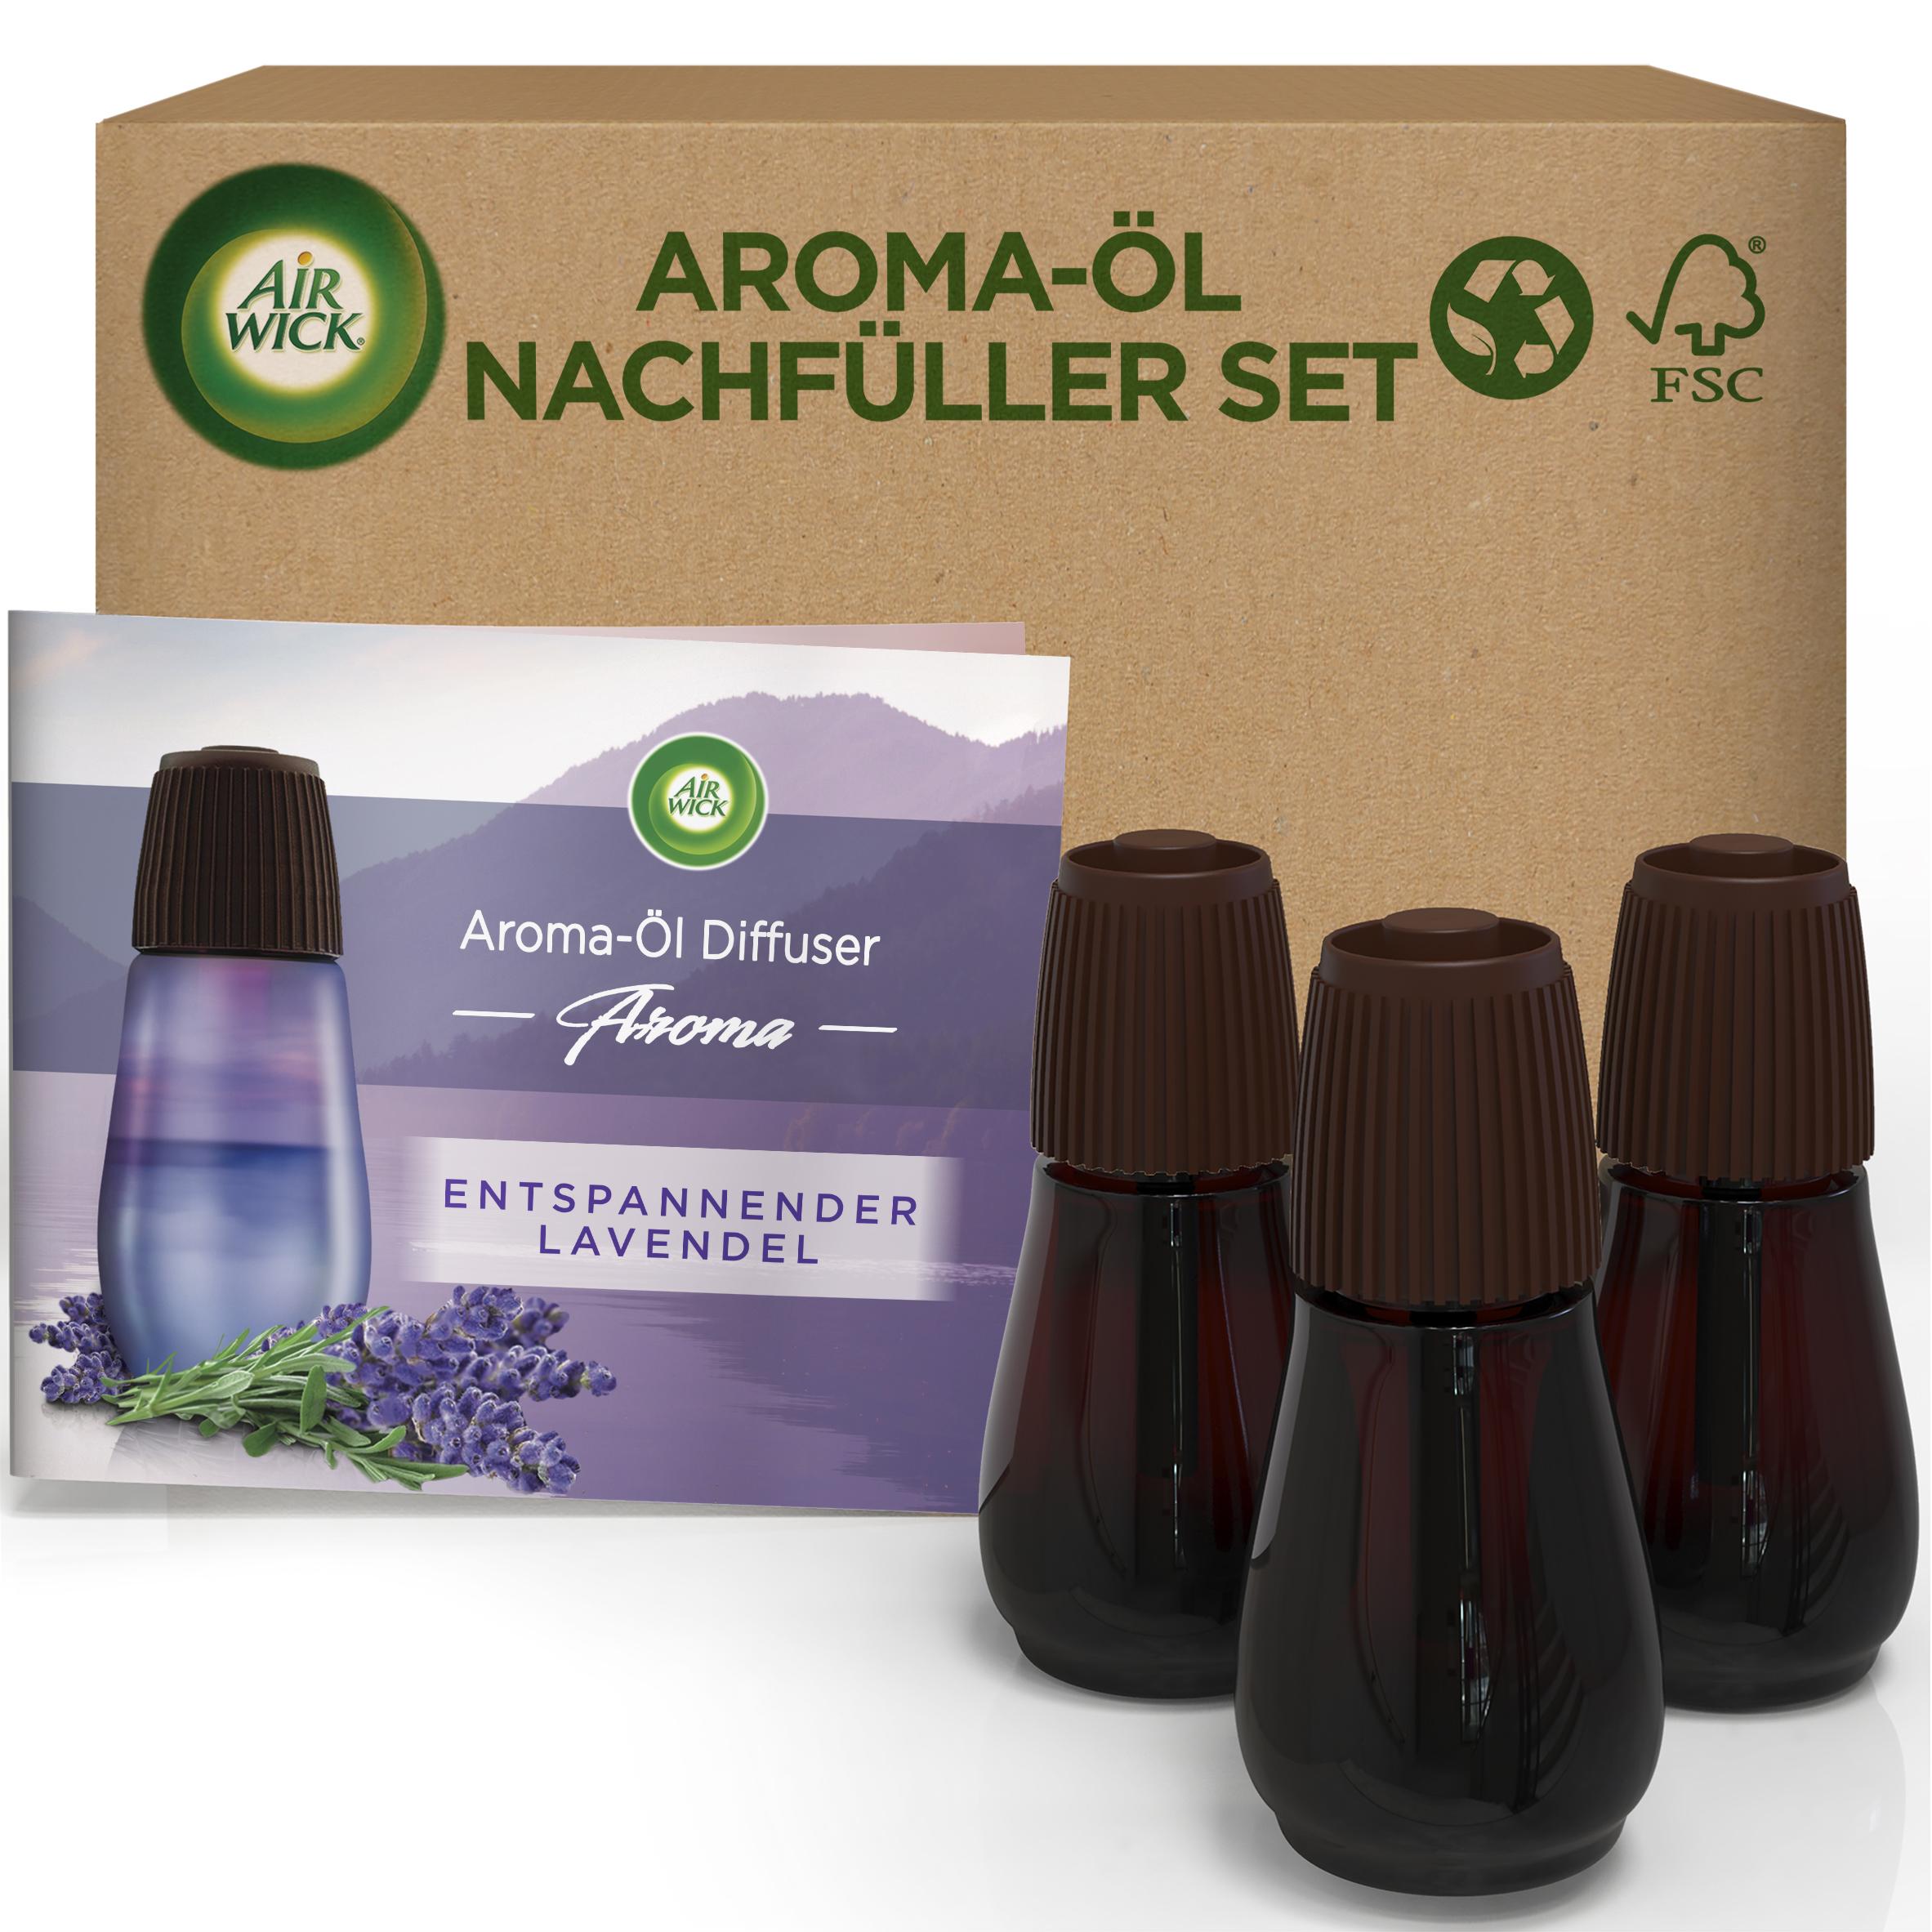 Air Wick Aroma-Öl Diffuser eCom Nachfüller-Set Entspannender Lavendel